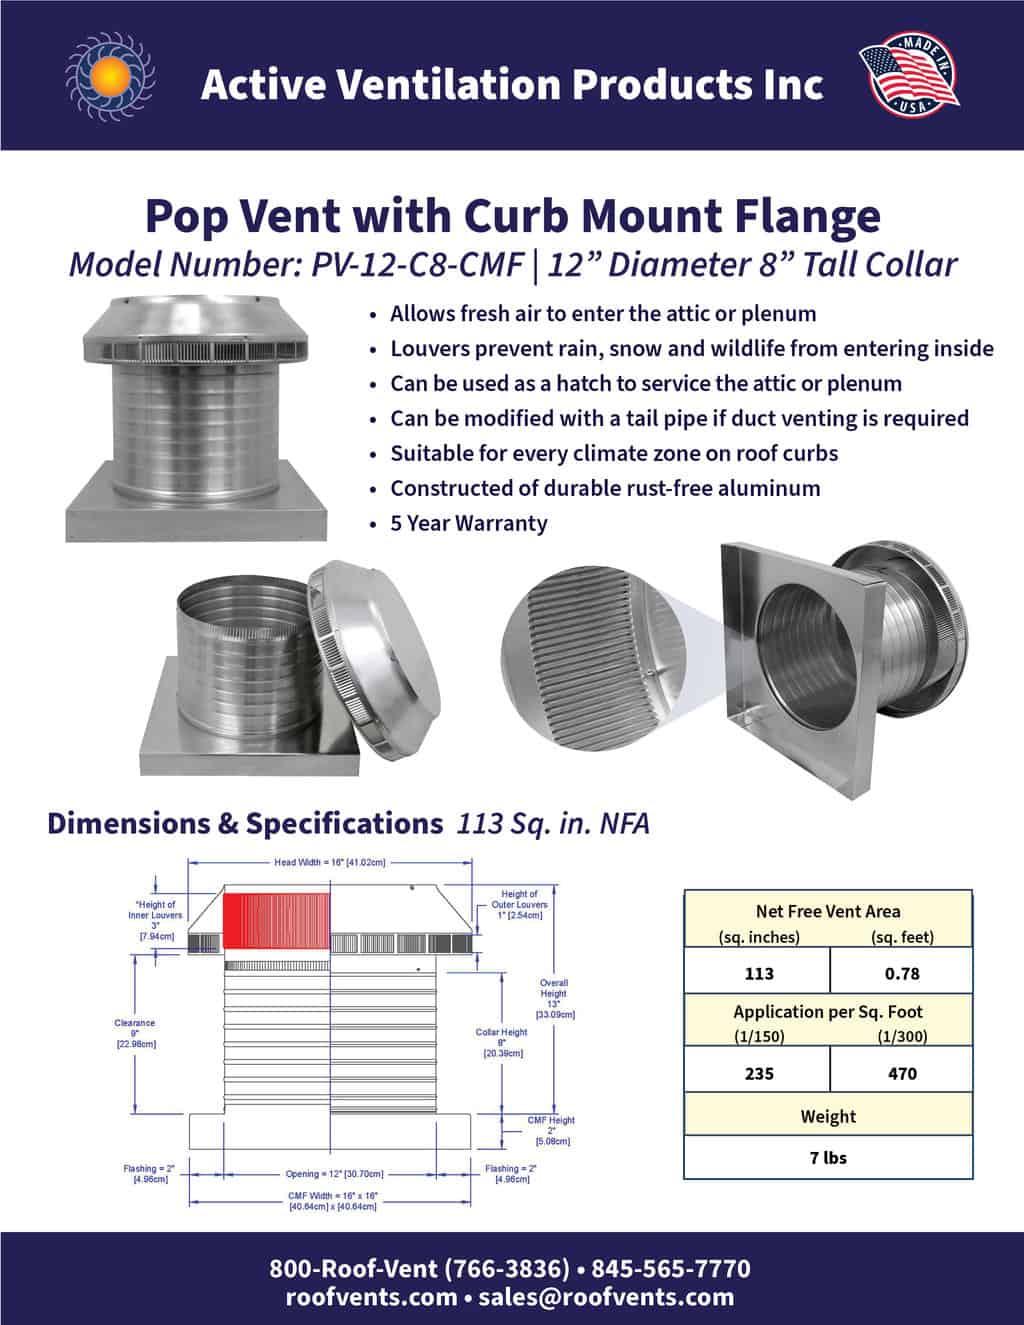 PV-12-C8-CMF-brochure